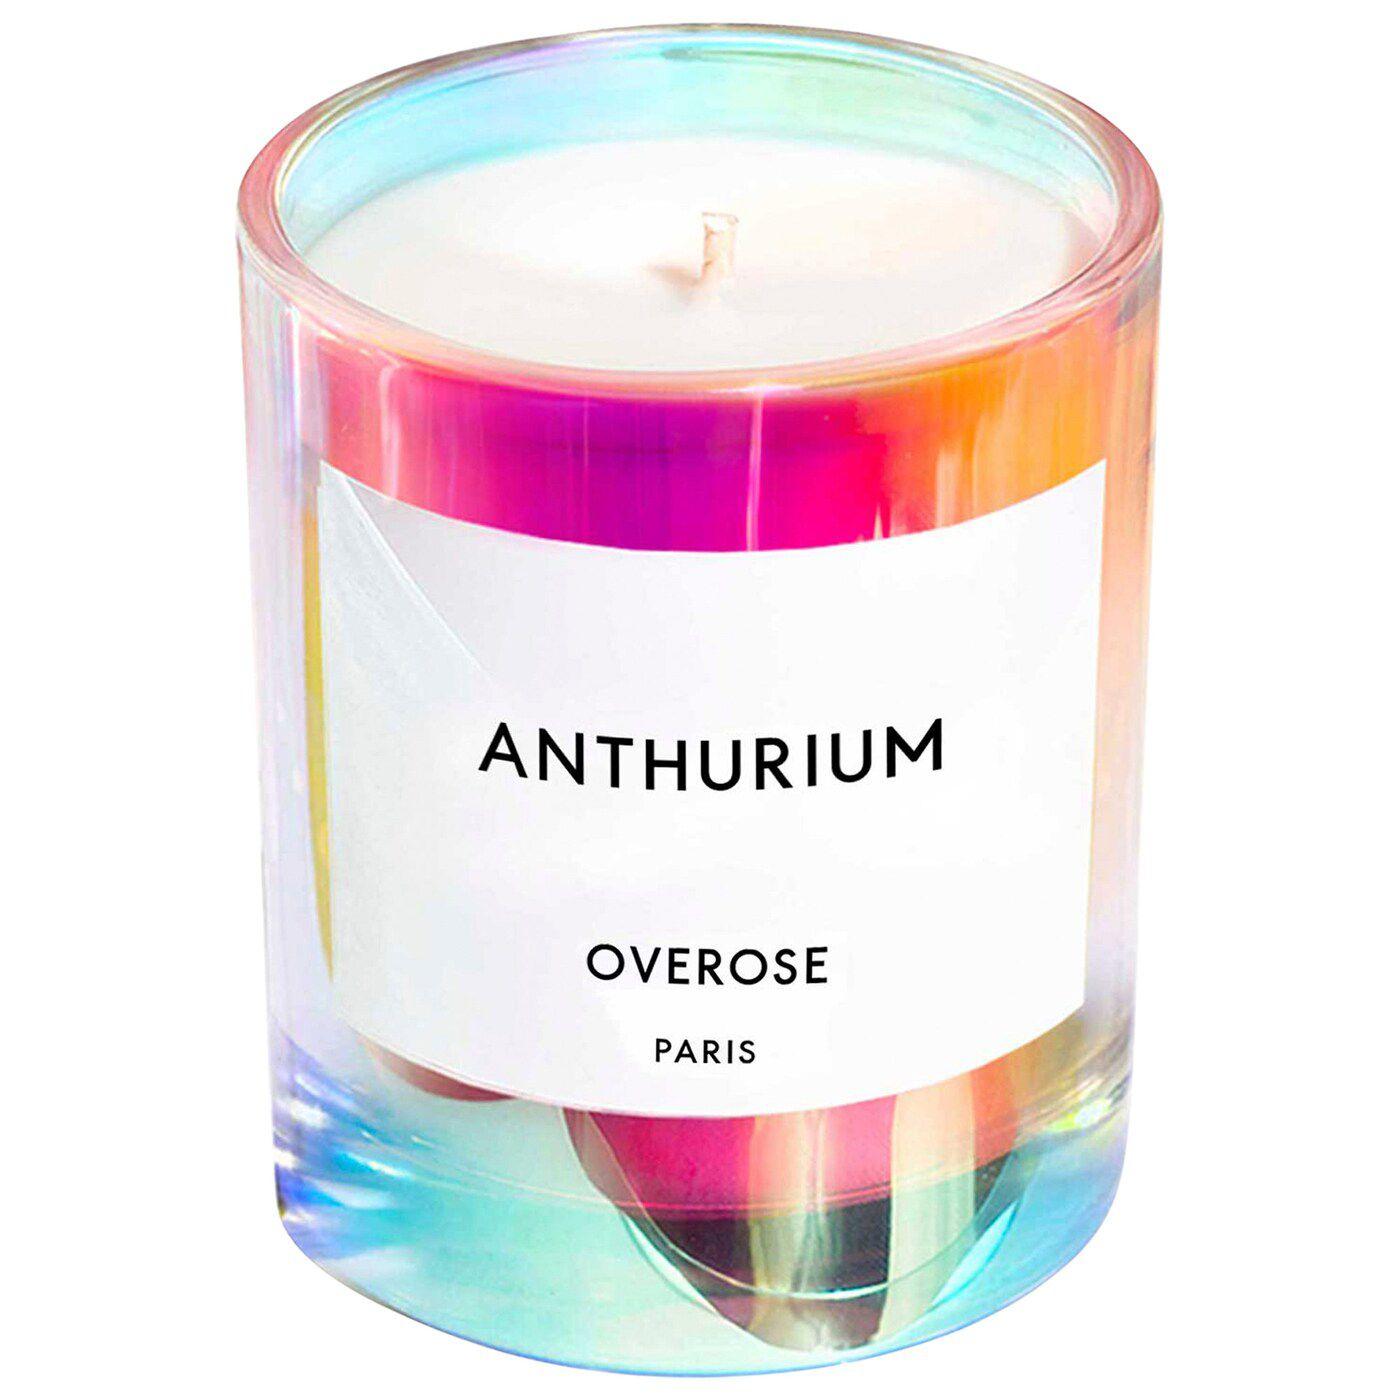 Overrose Anthurium Scented Candle